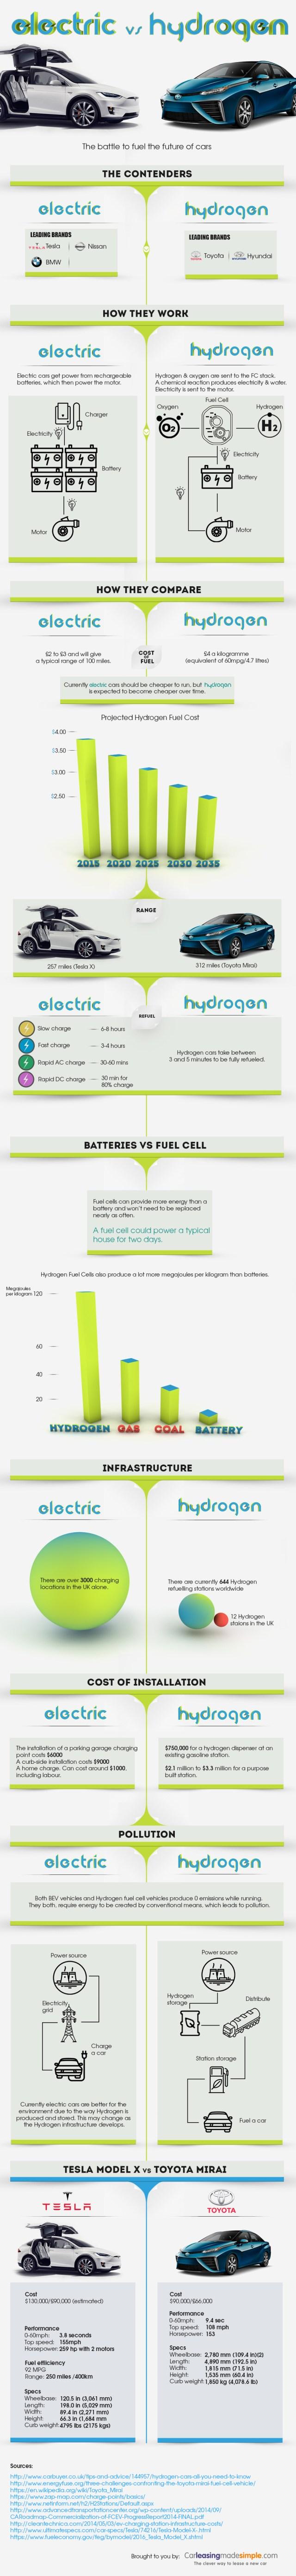 Electric vs Hydrogen